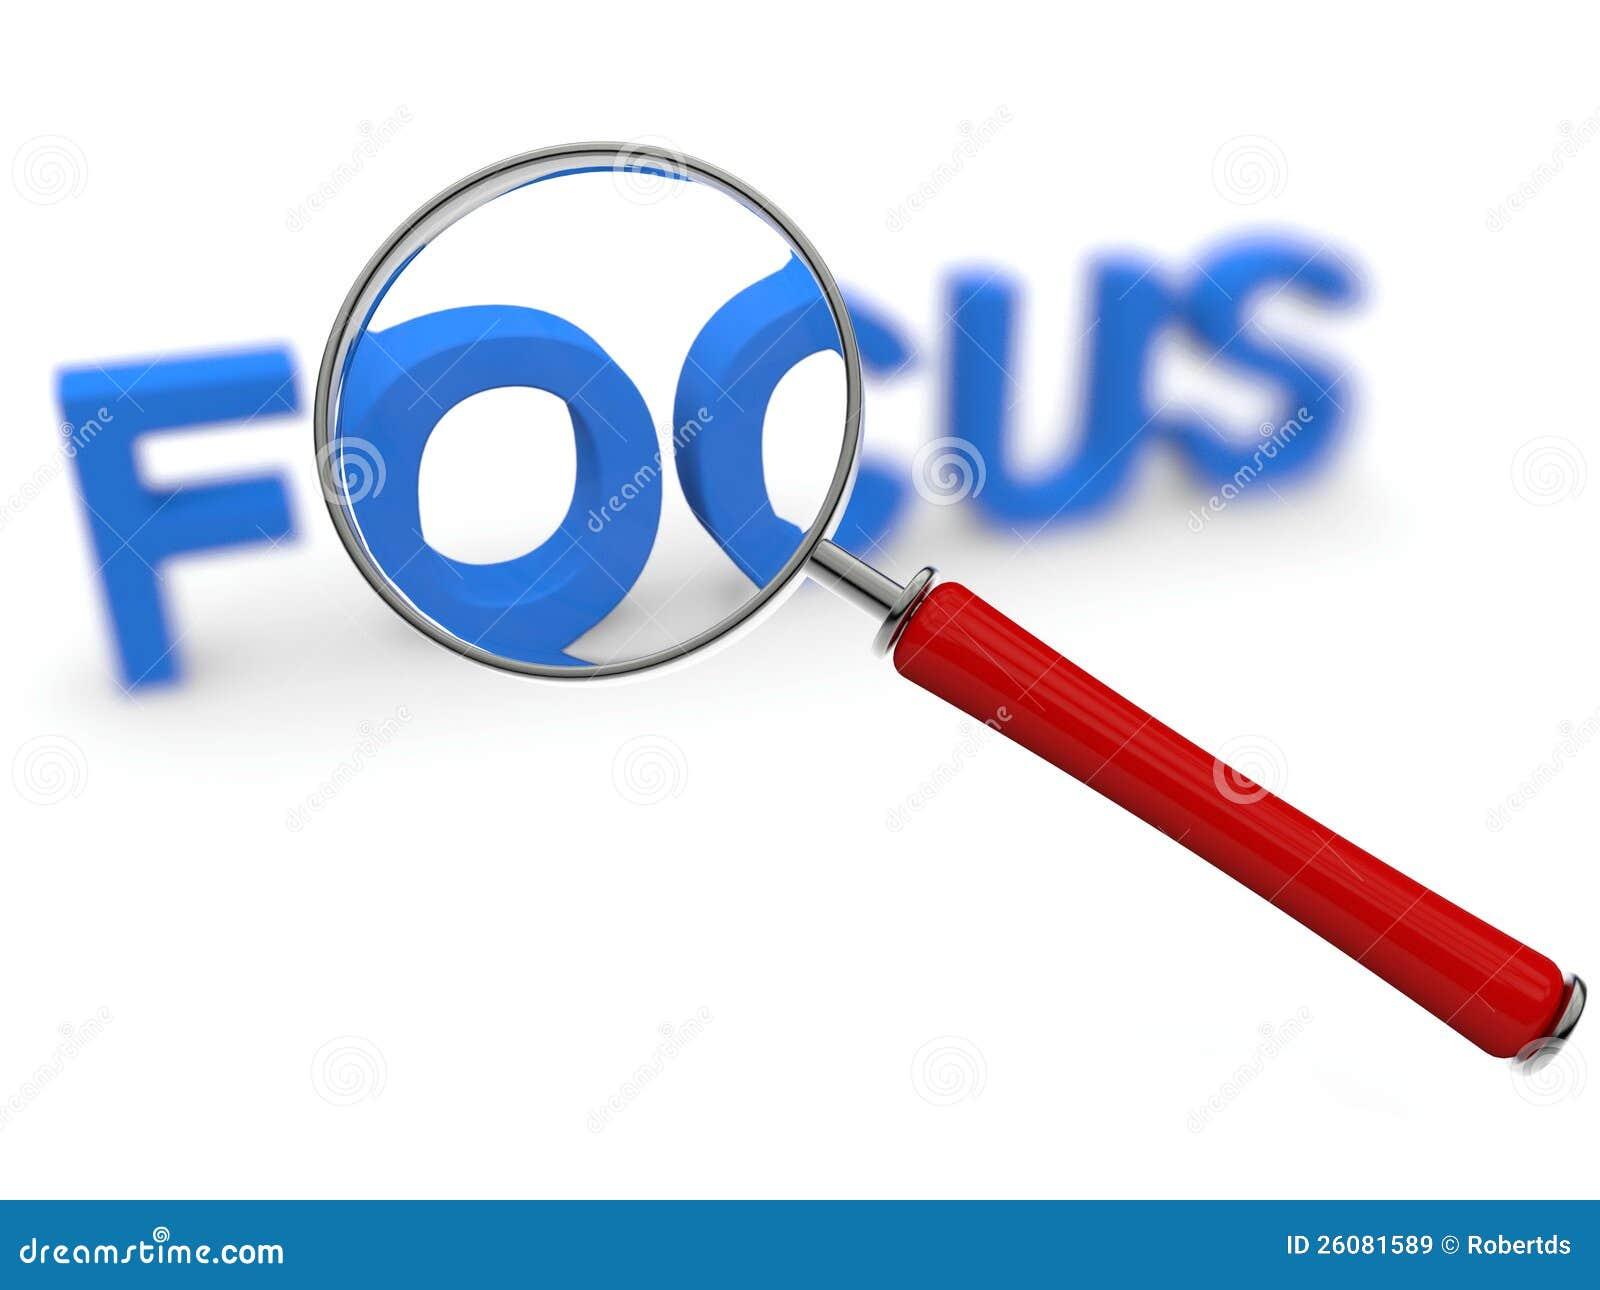 Healthy Foods That boost Brain Power focus-concept-magnifier-26081589